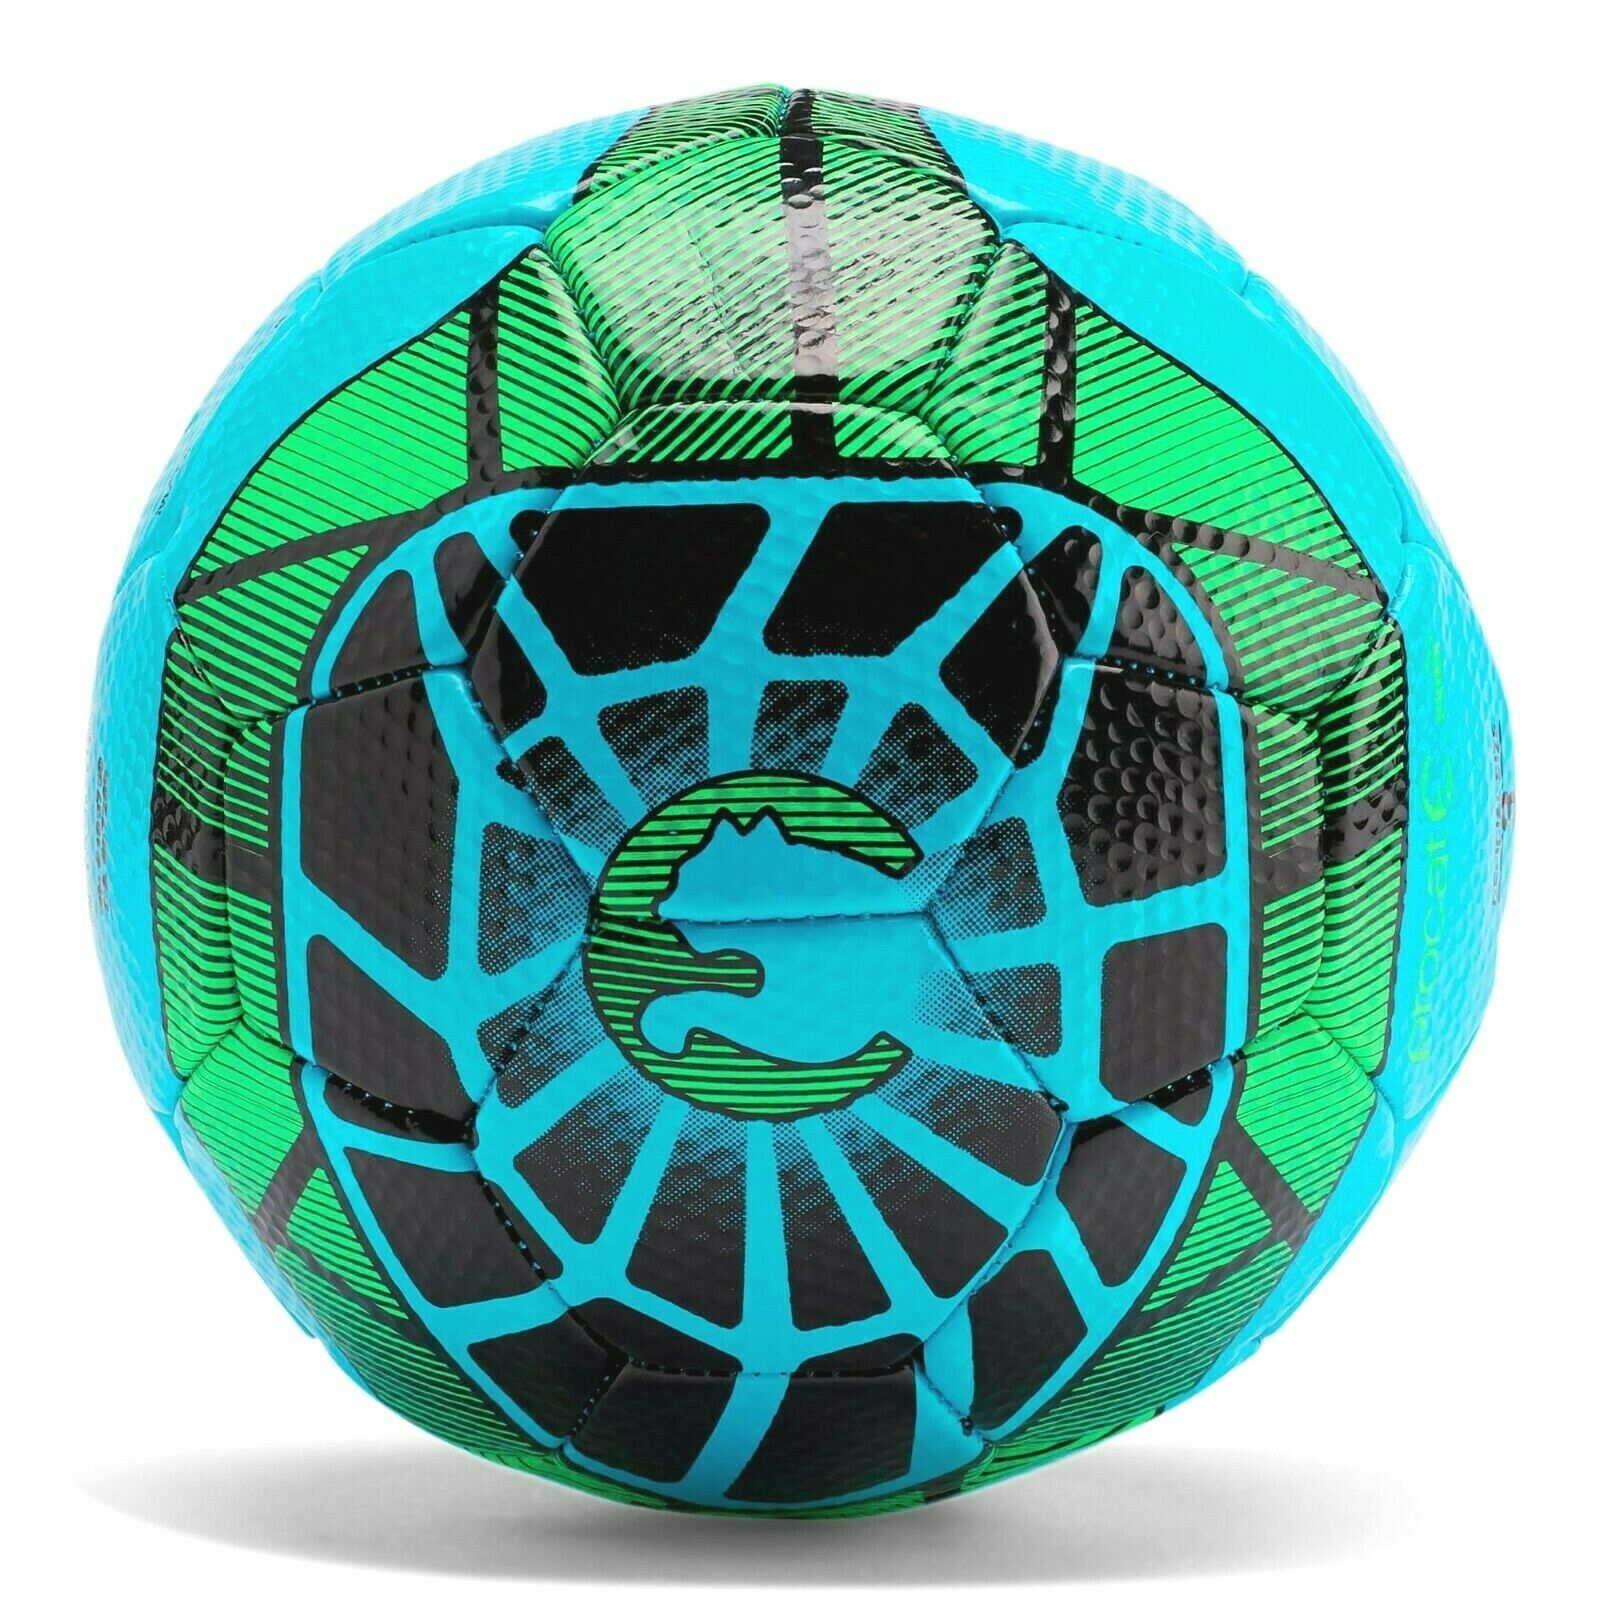 Puma ProCat Geomax Green Black Blue Competition Soccer Ball Offiziell Sz 4 or 5